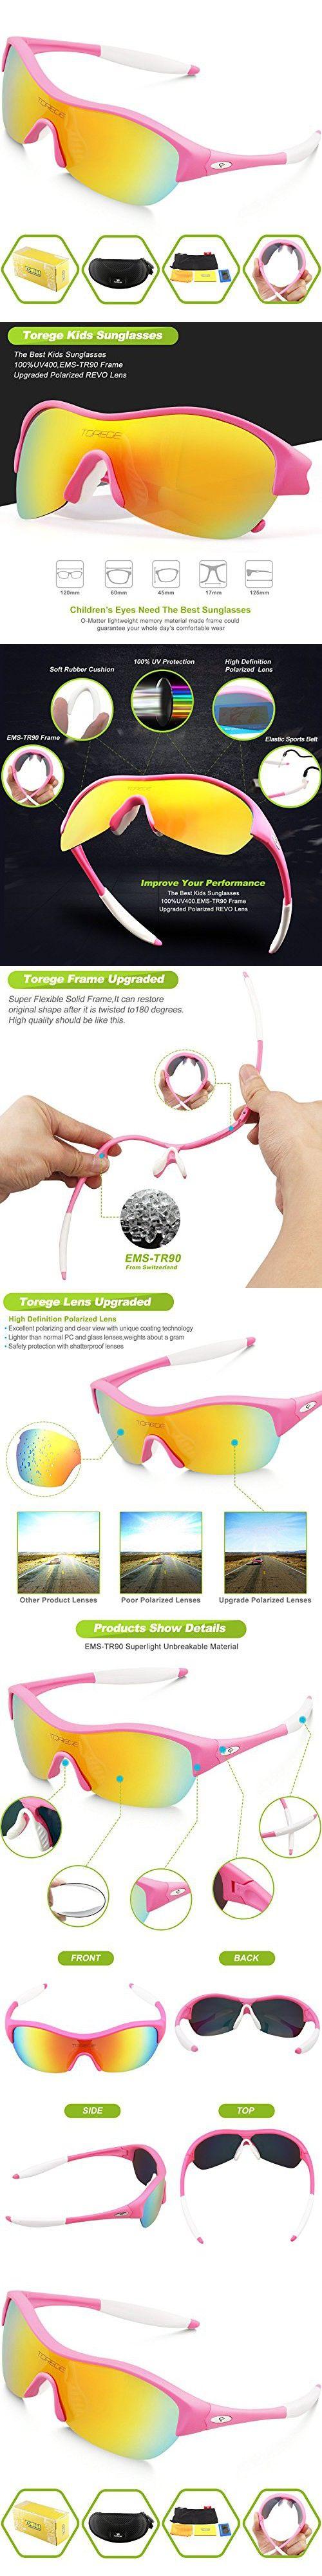 9ed9ed2700 Torege Tr90 Flexible Kids Sports Sunglasses Polarized Glasses for Boys  Girls Age 3-15 Trk001 (White blue)